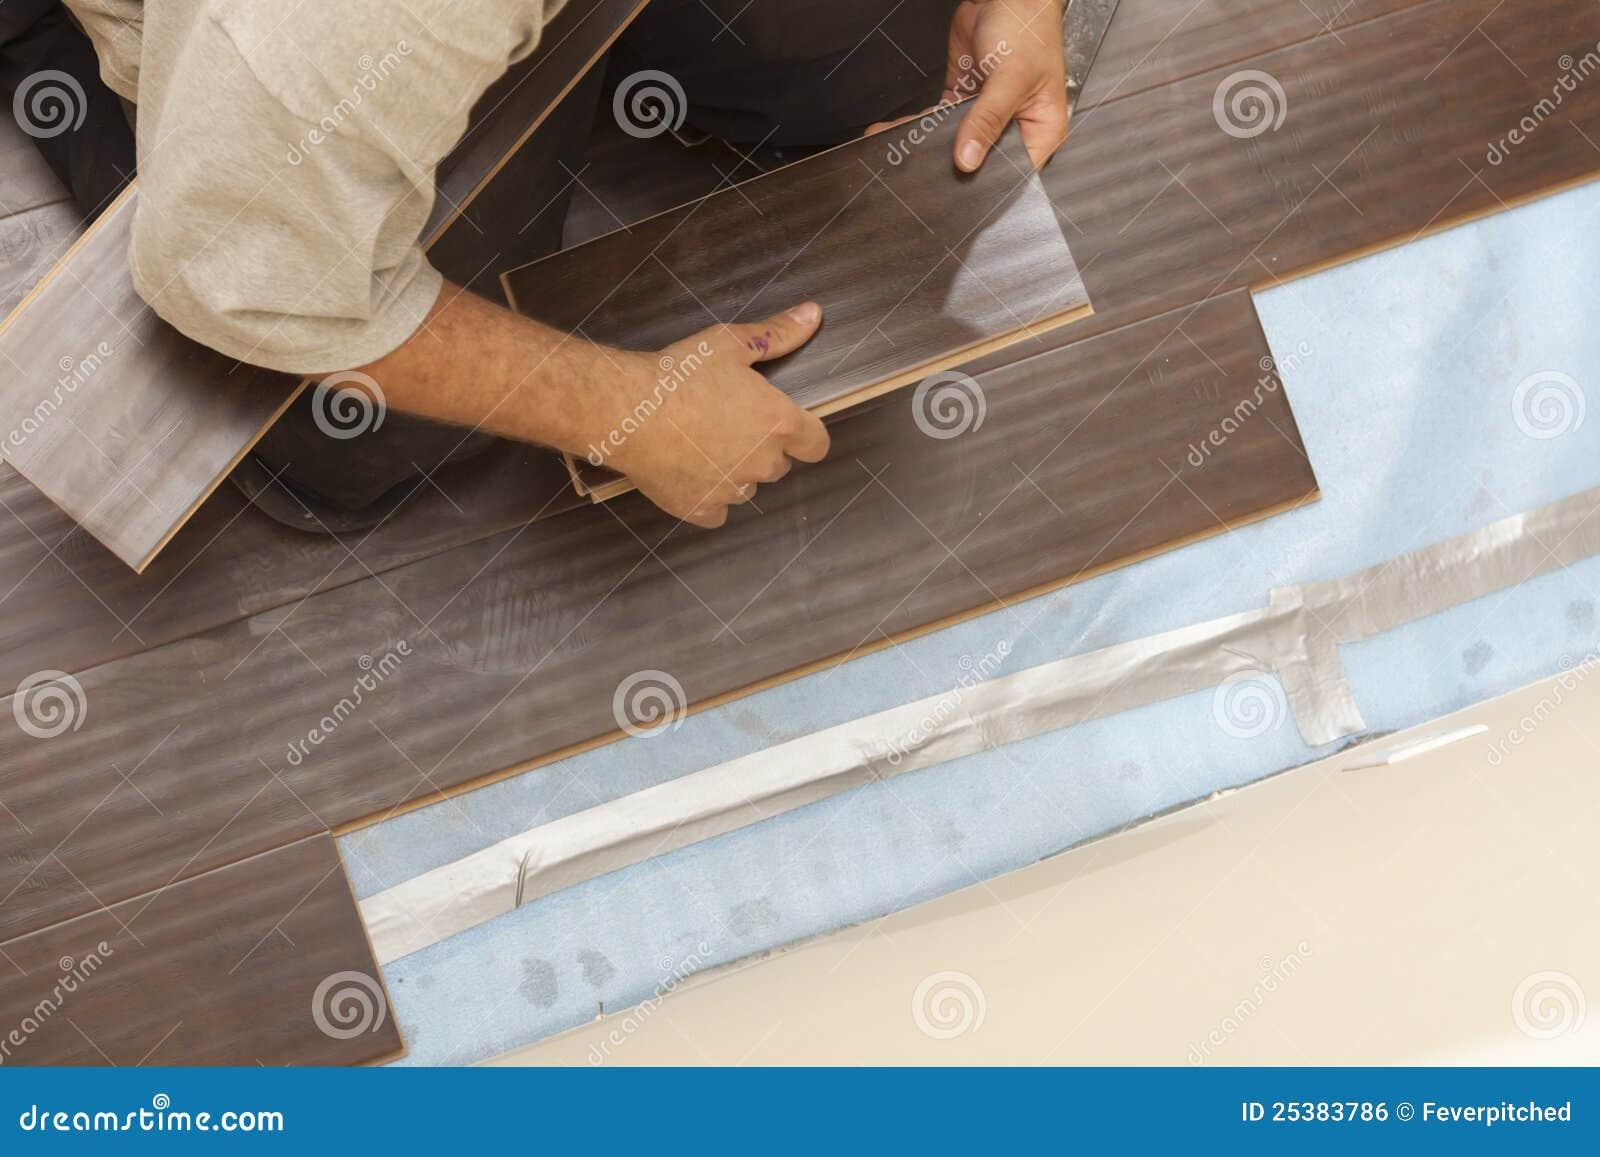 Man Installing New Laminate Wood Flooring